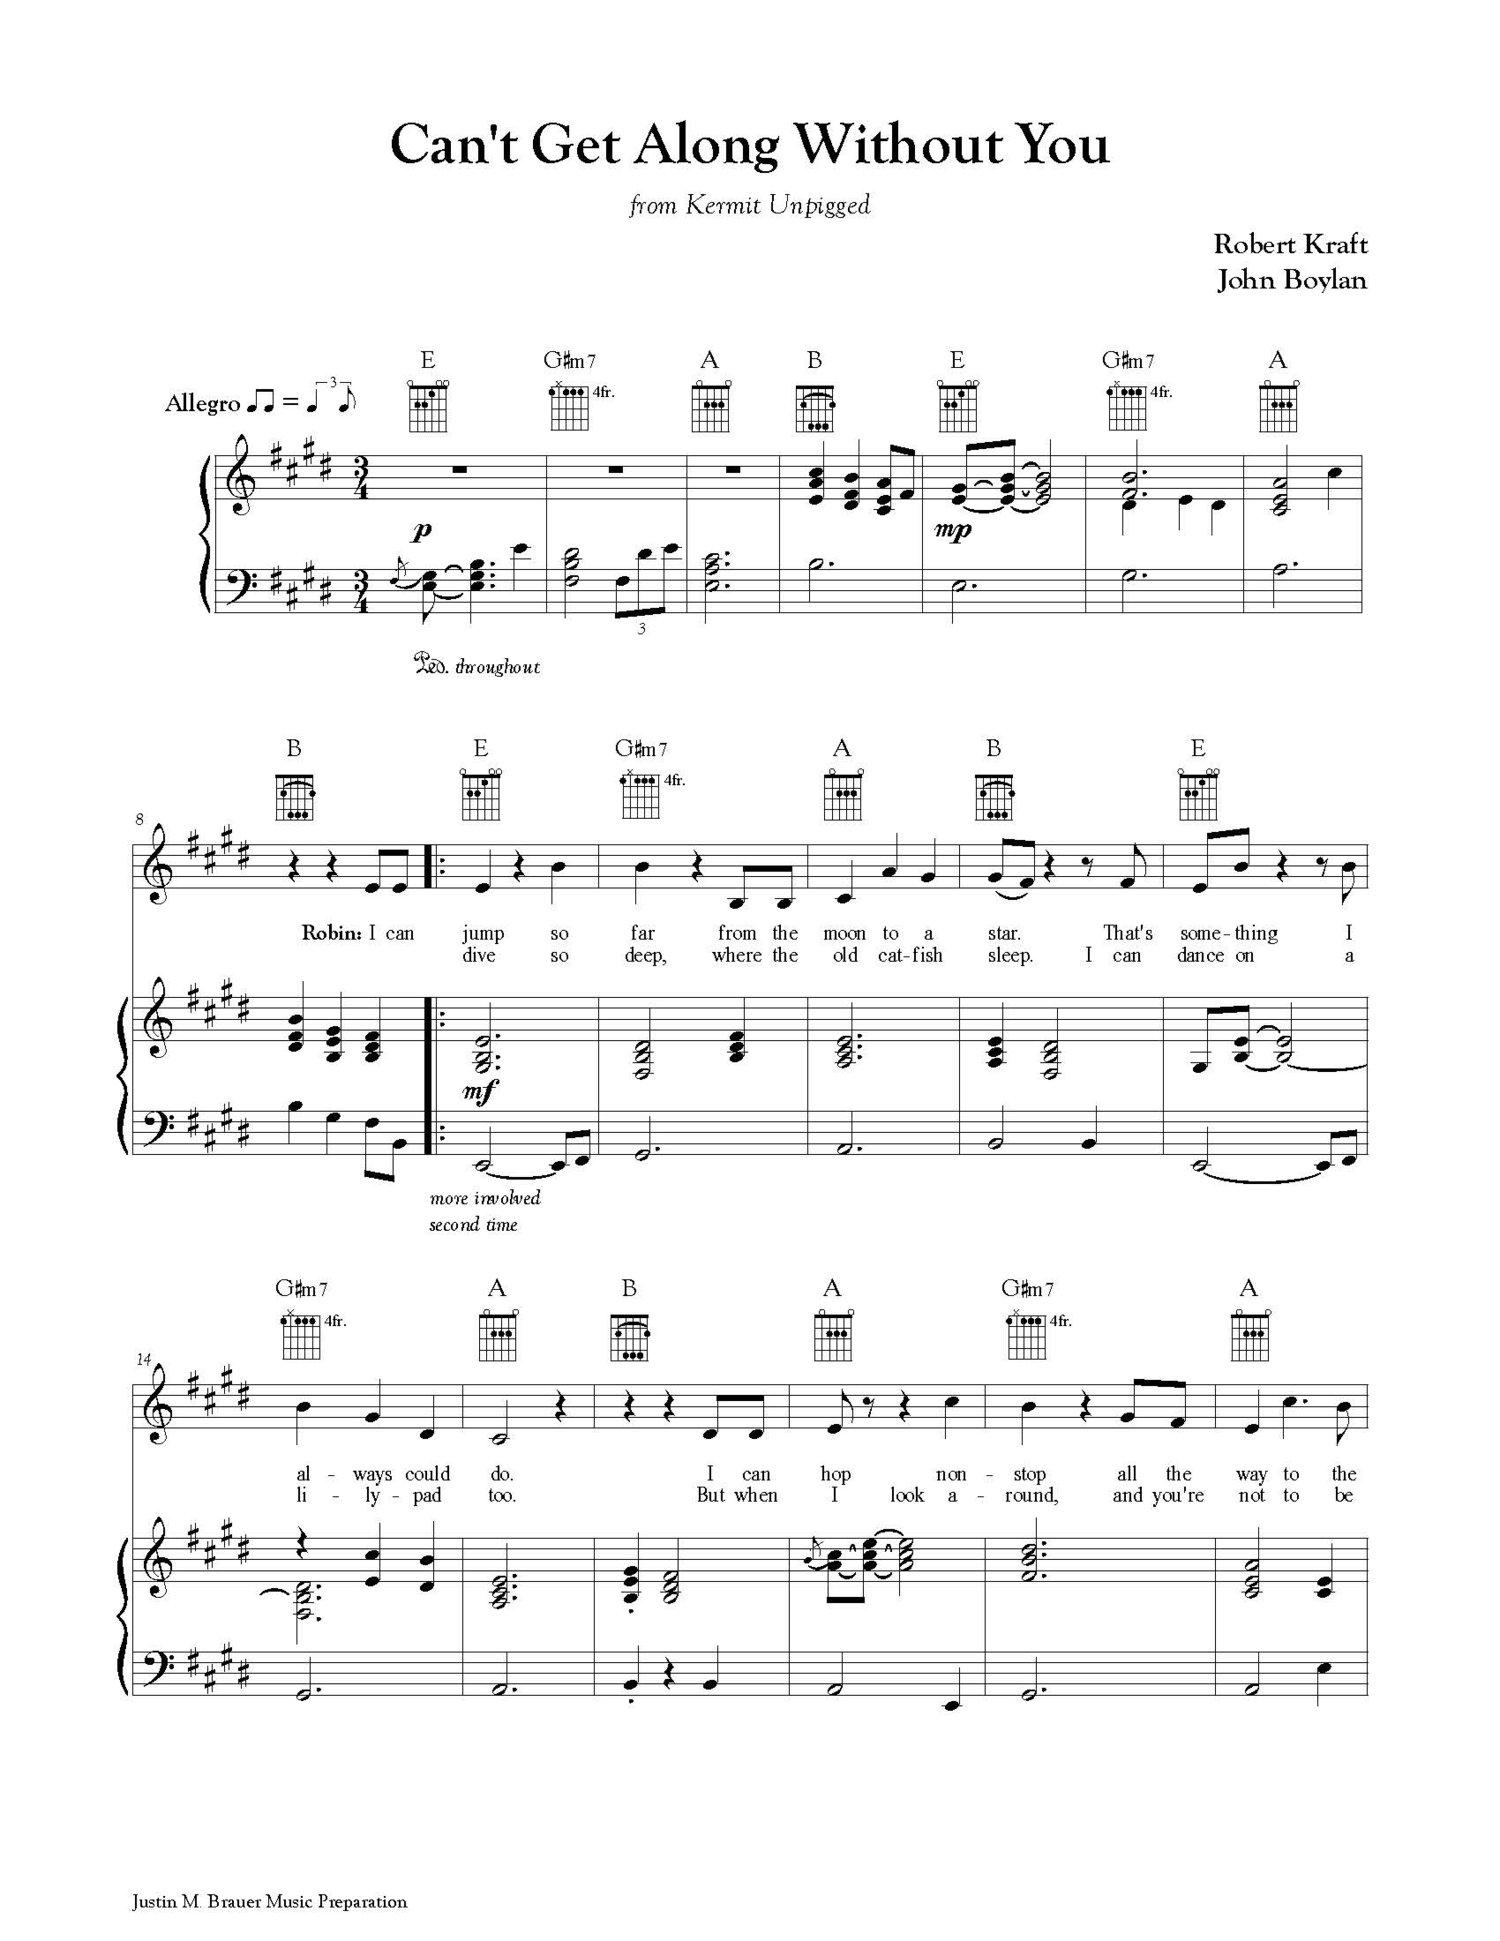 Music Preparation — Justin M  Brauer